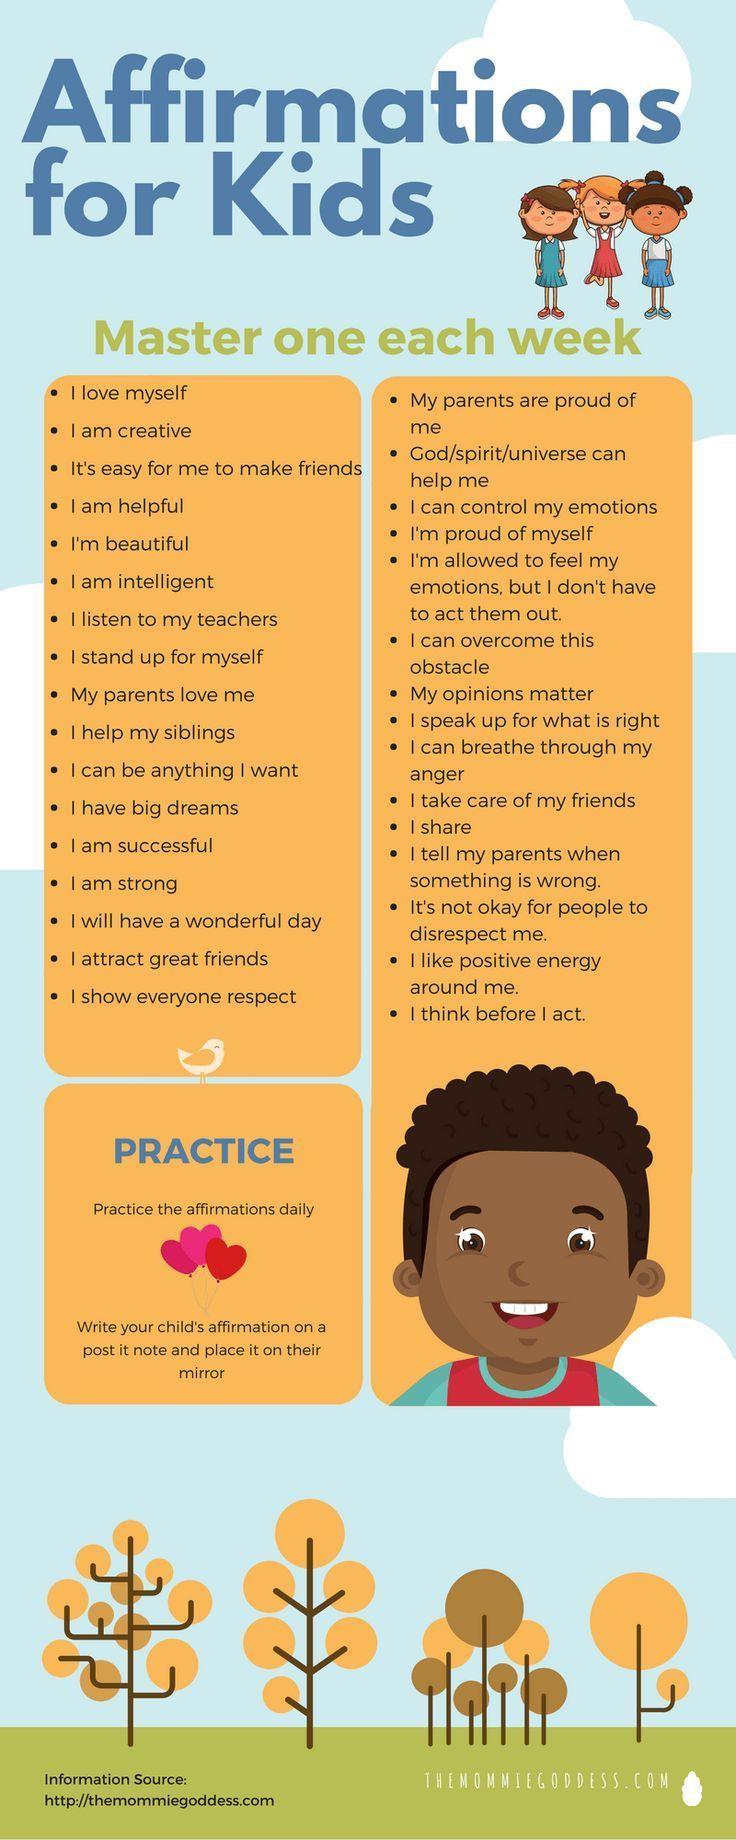 Affirmations for Kids Babies Parenting Children Affirmations